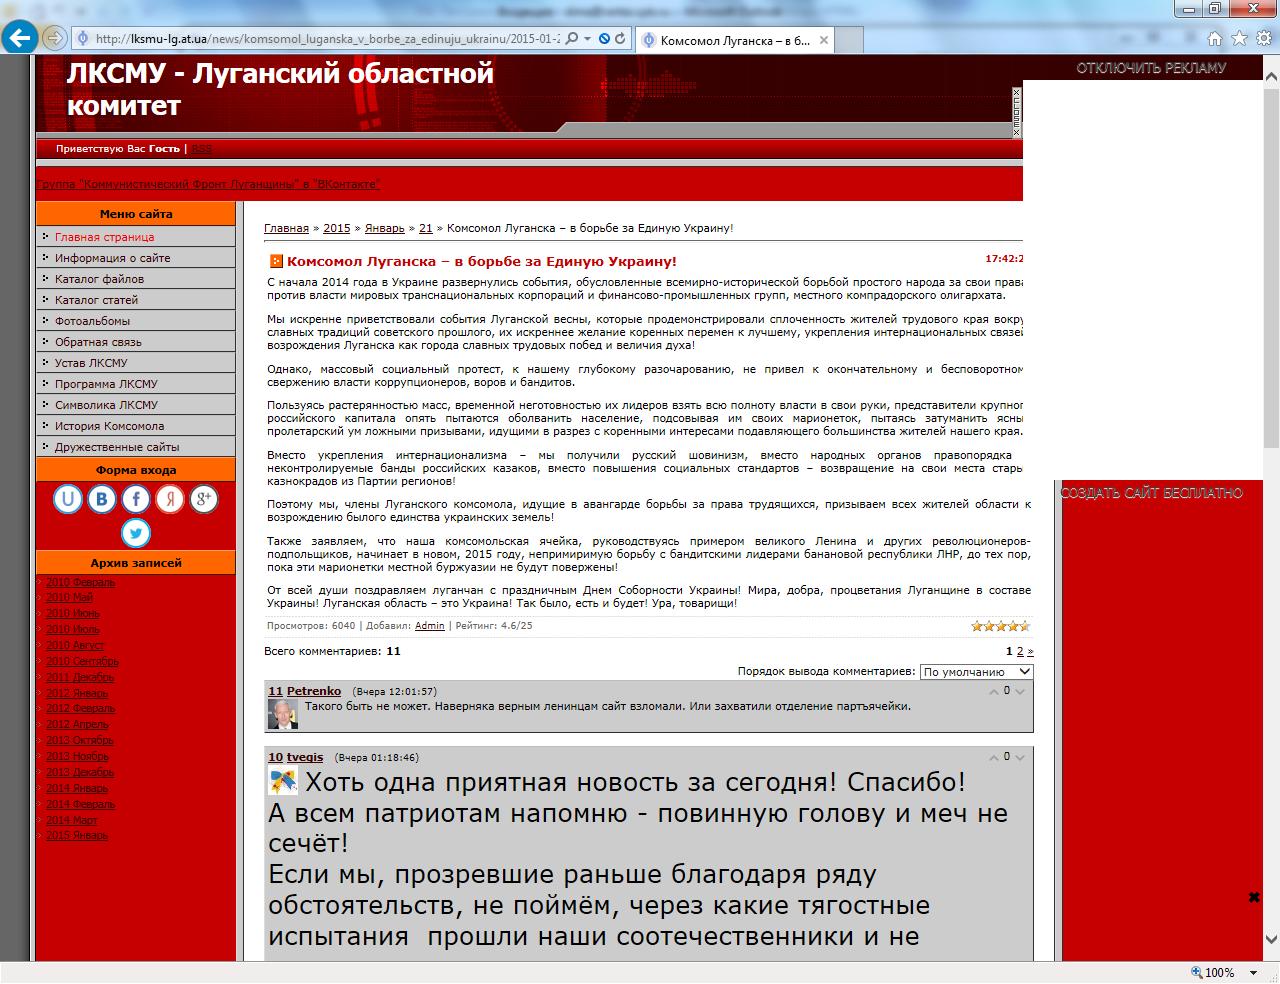 комсомол Луганска за единую украину